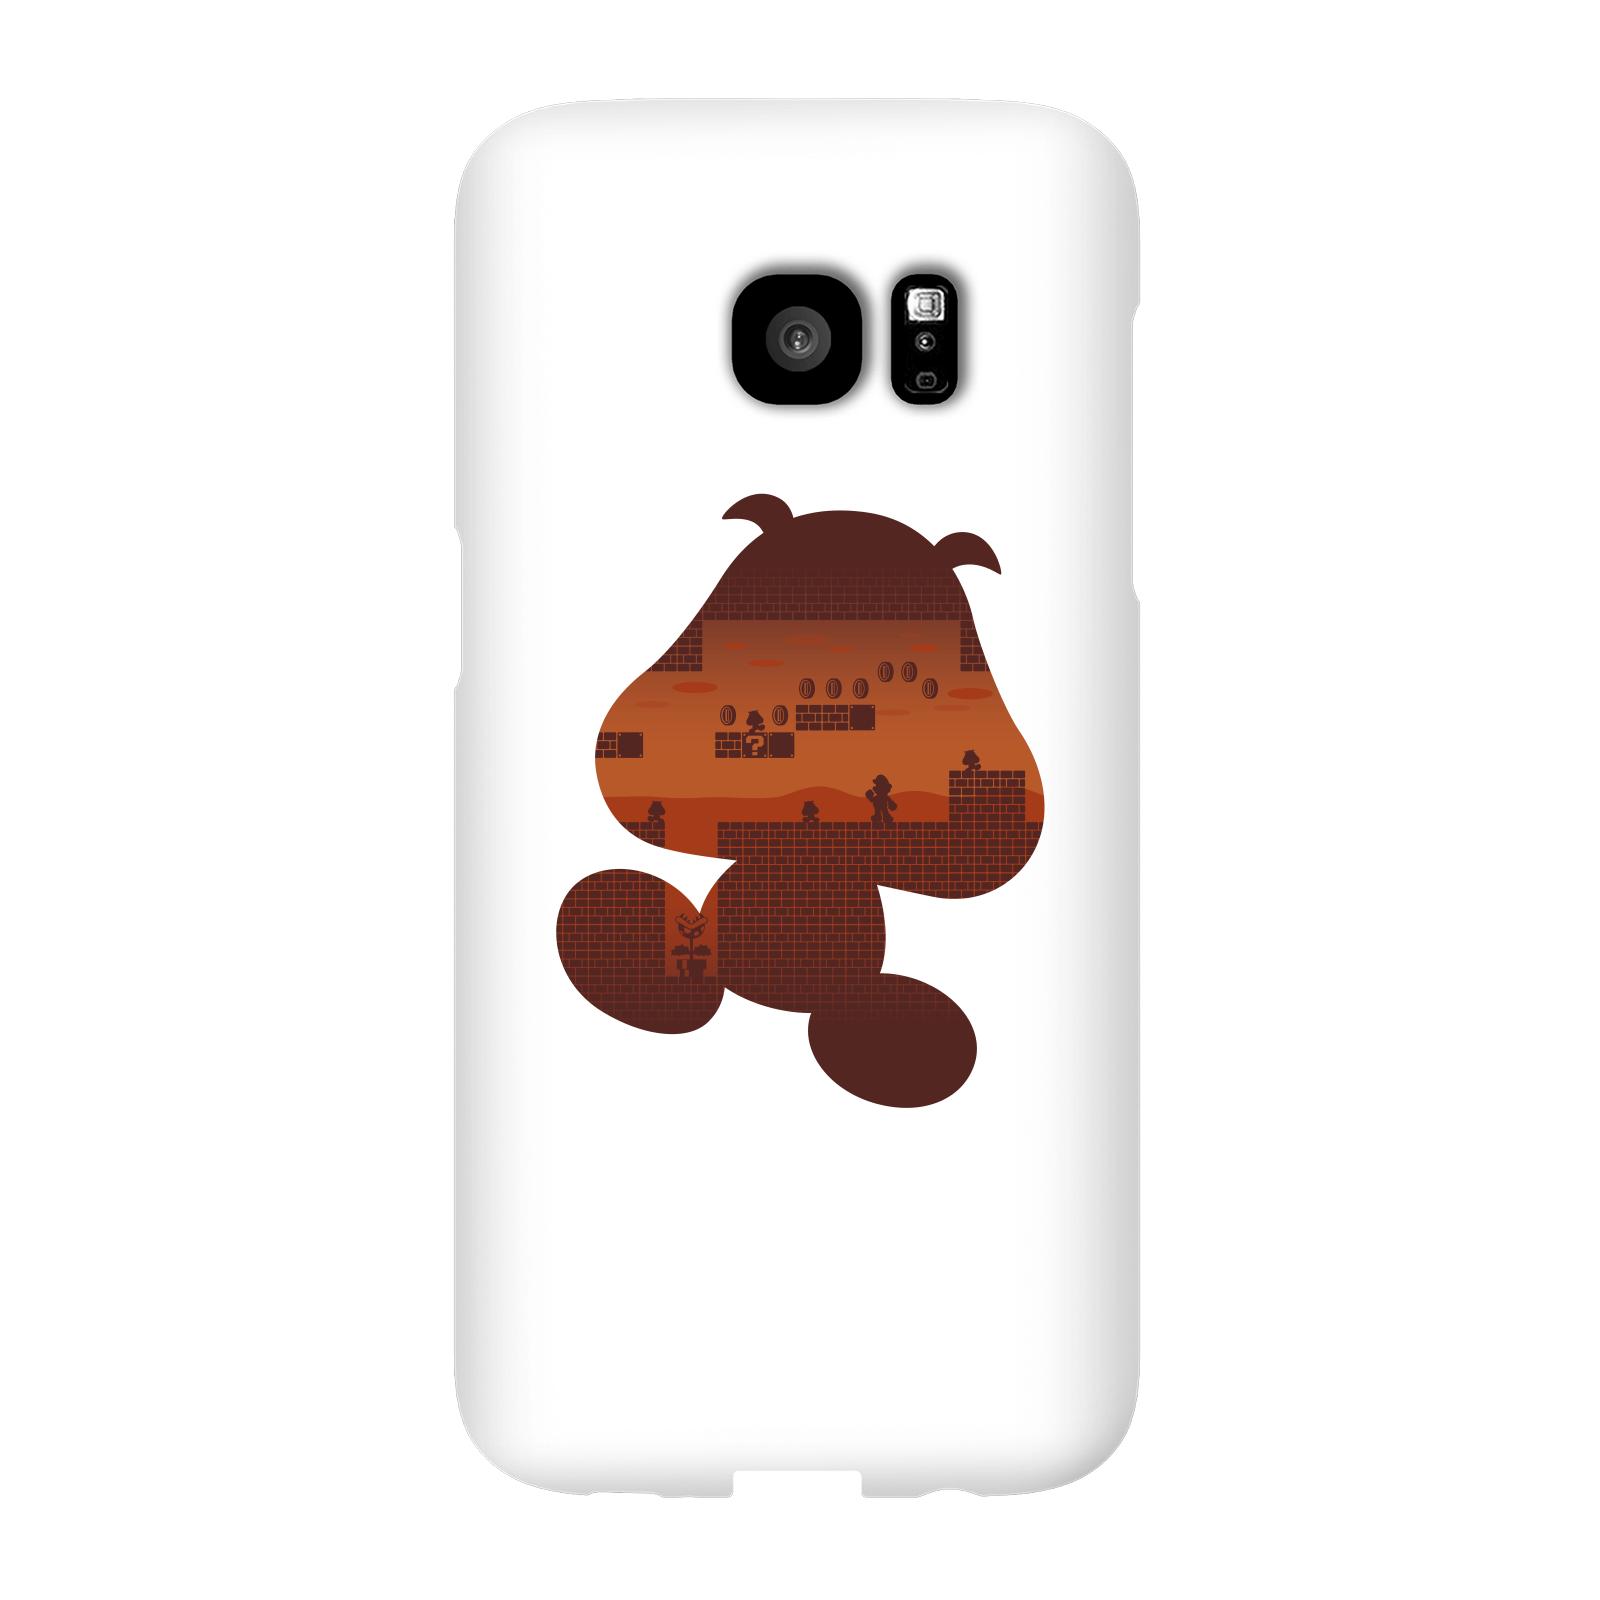 Nintendo Super Mario Goomba Silhouette Smartphone Hülle - Samsung S7 Edge - Snap Hülle Matt